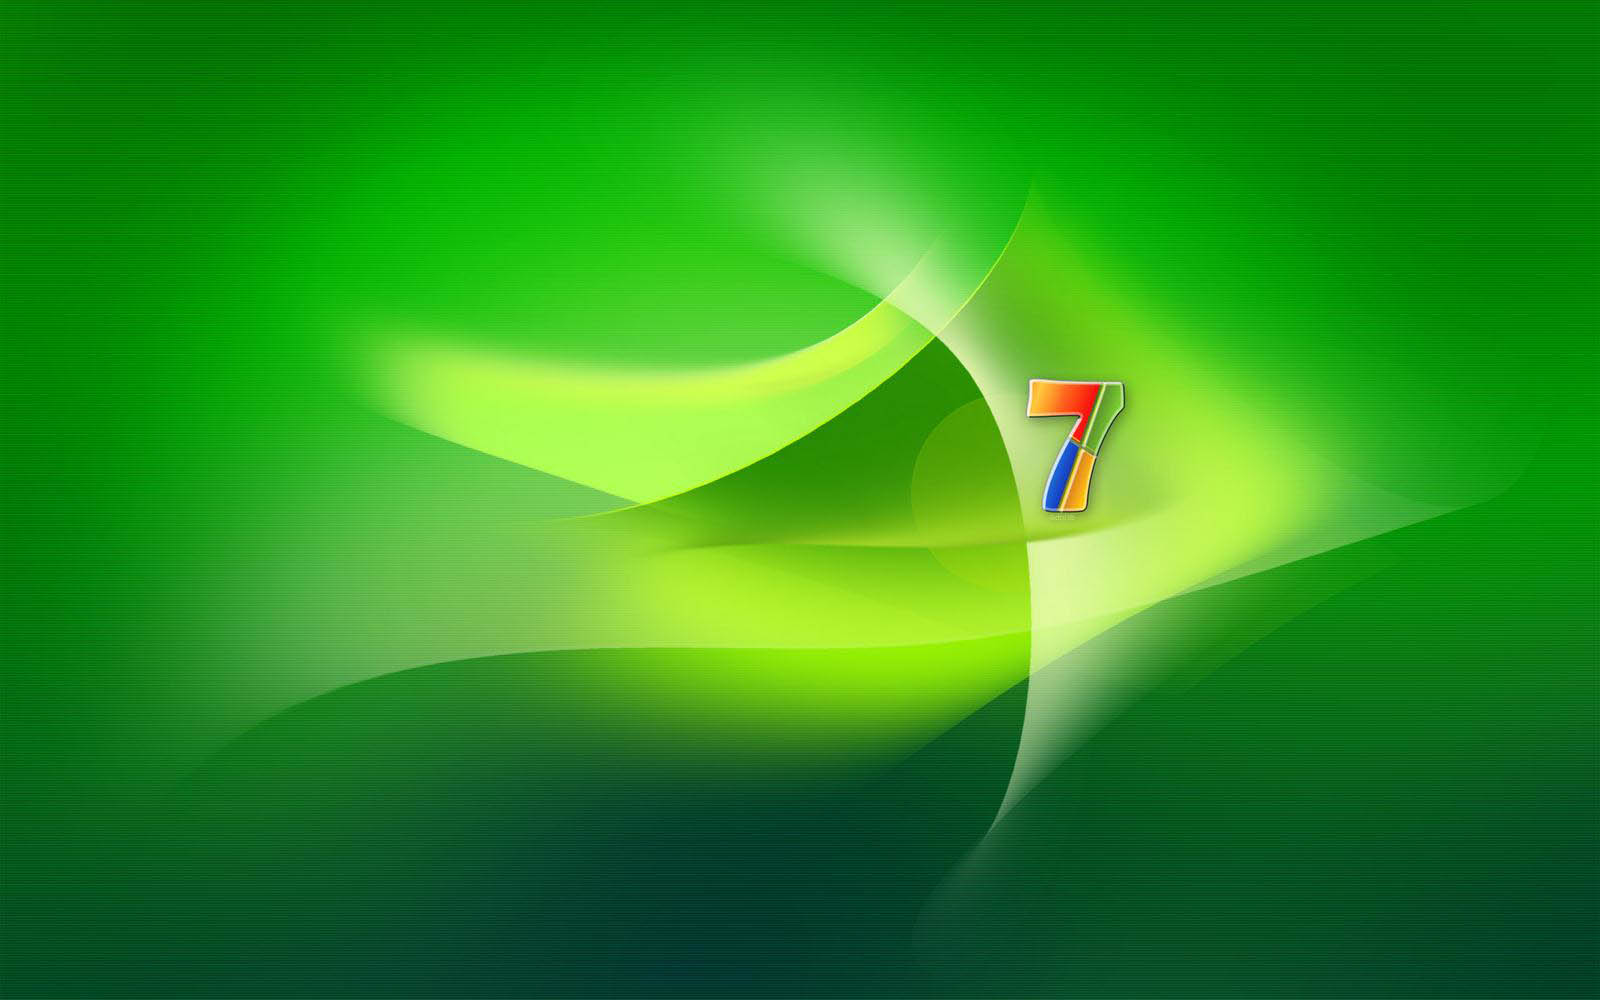 Windows 7 Wallpapers for Desktop Backgrounds